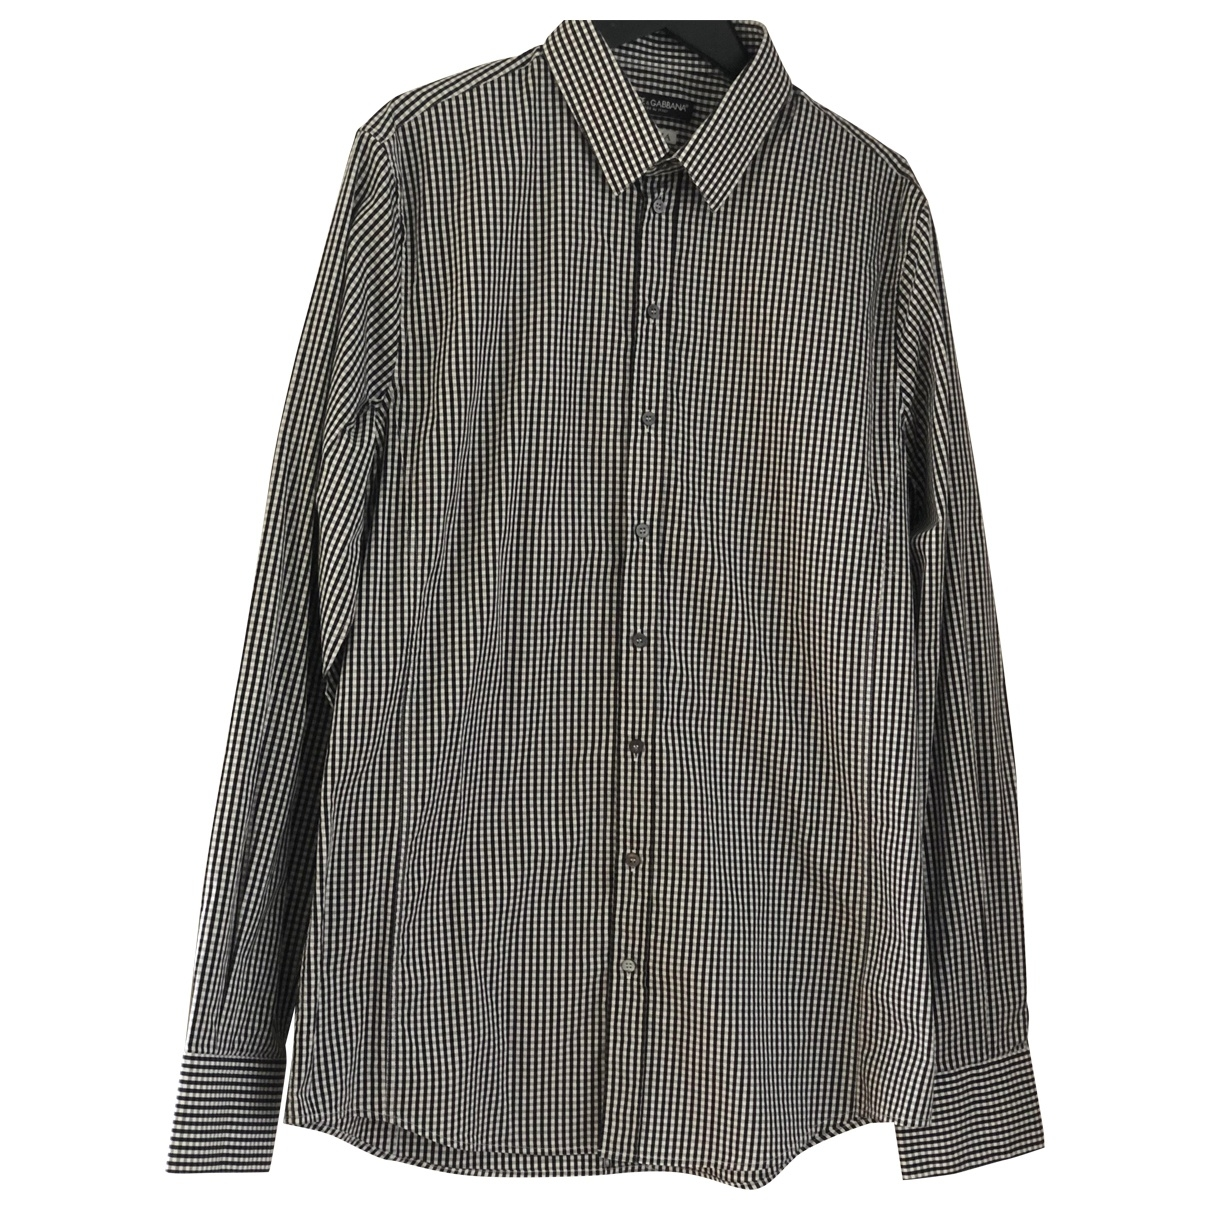 Dolce & Gabbana \N Black Cotton Shirts for Men 41 EU (tour de cou / collar)